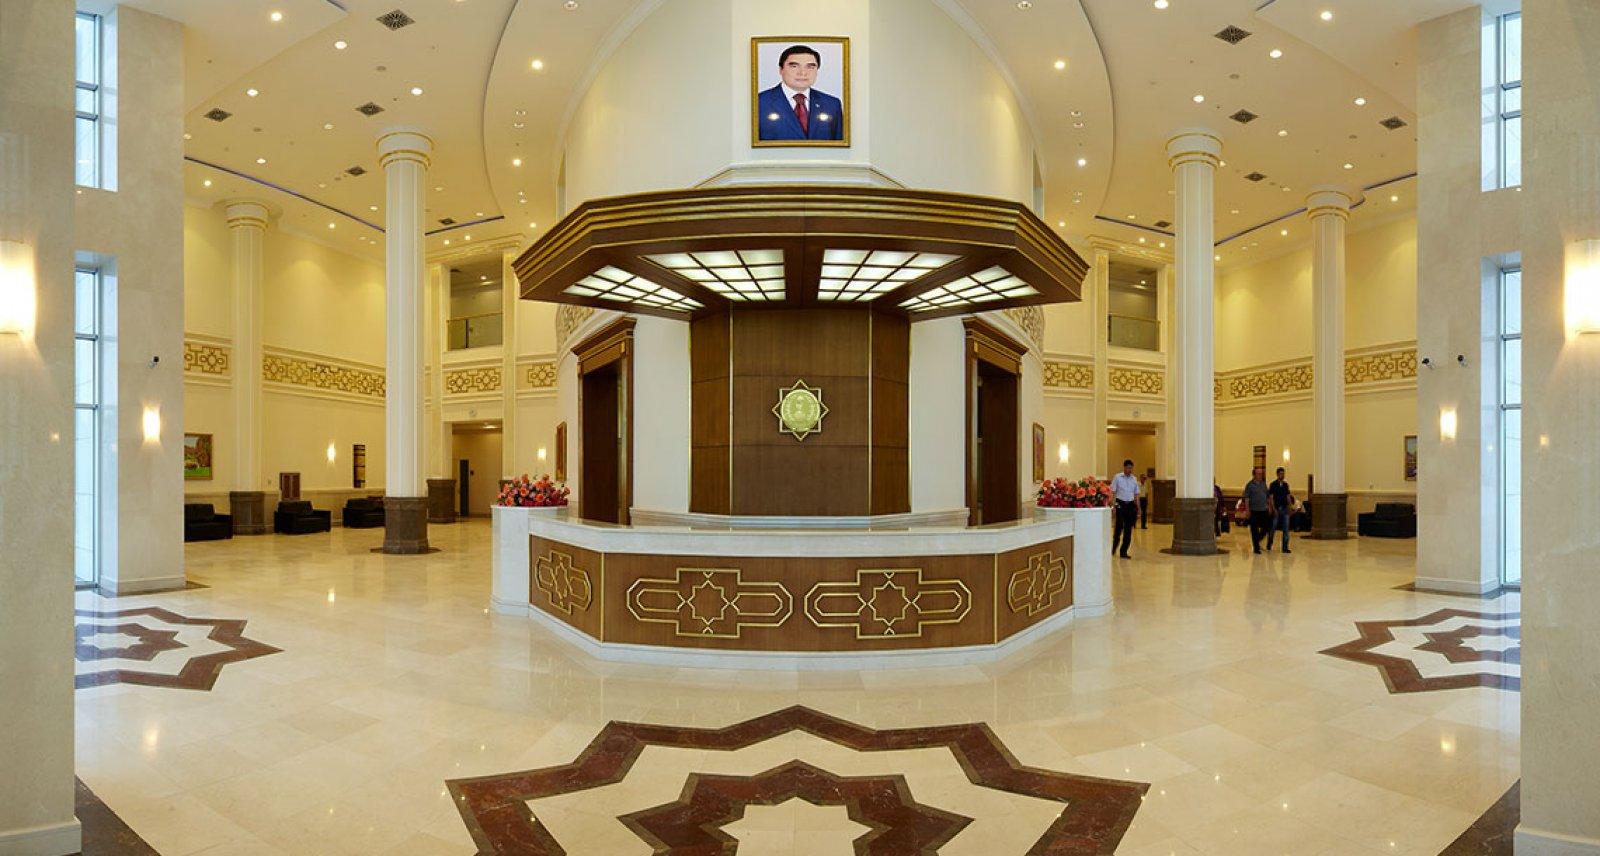 Onkoloji Hastanesi, Türkmenistan